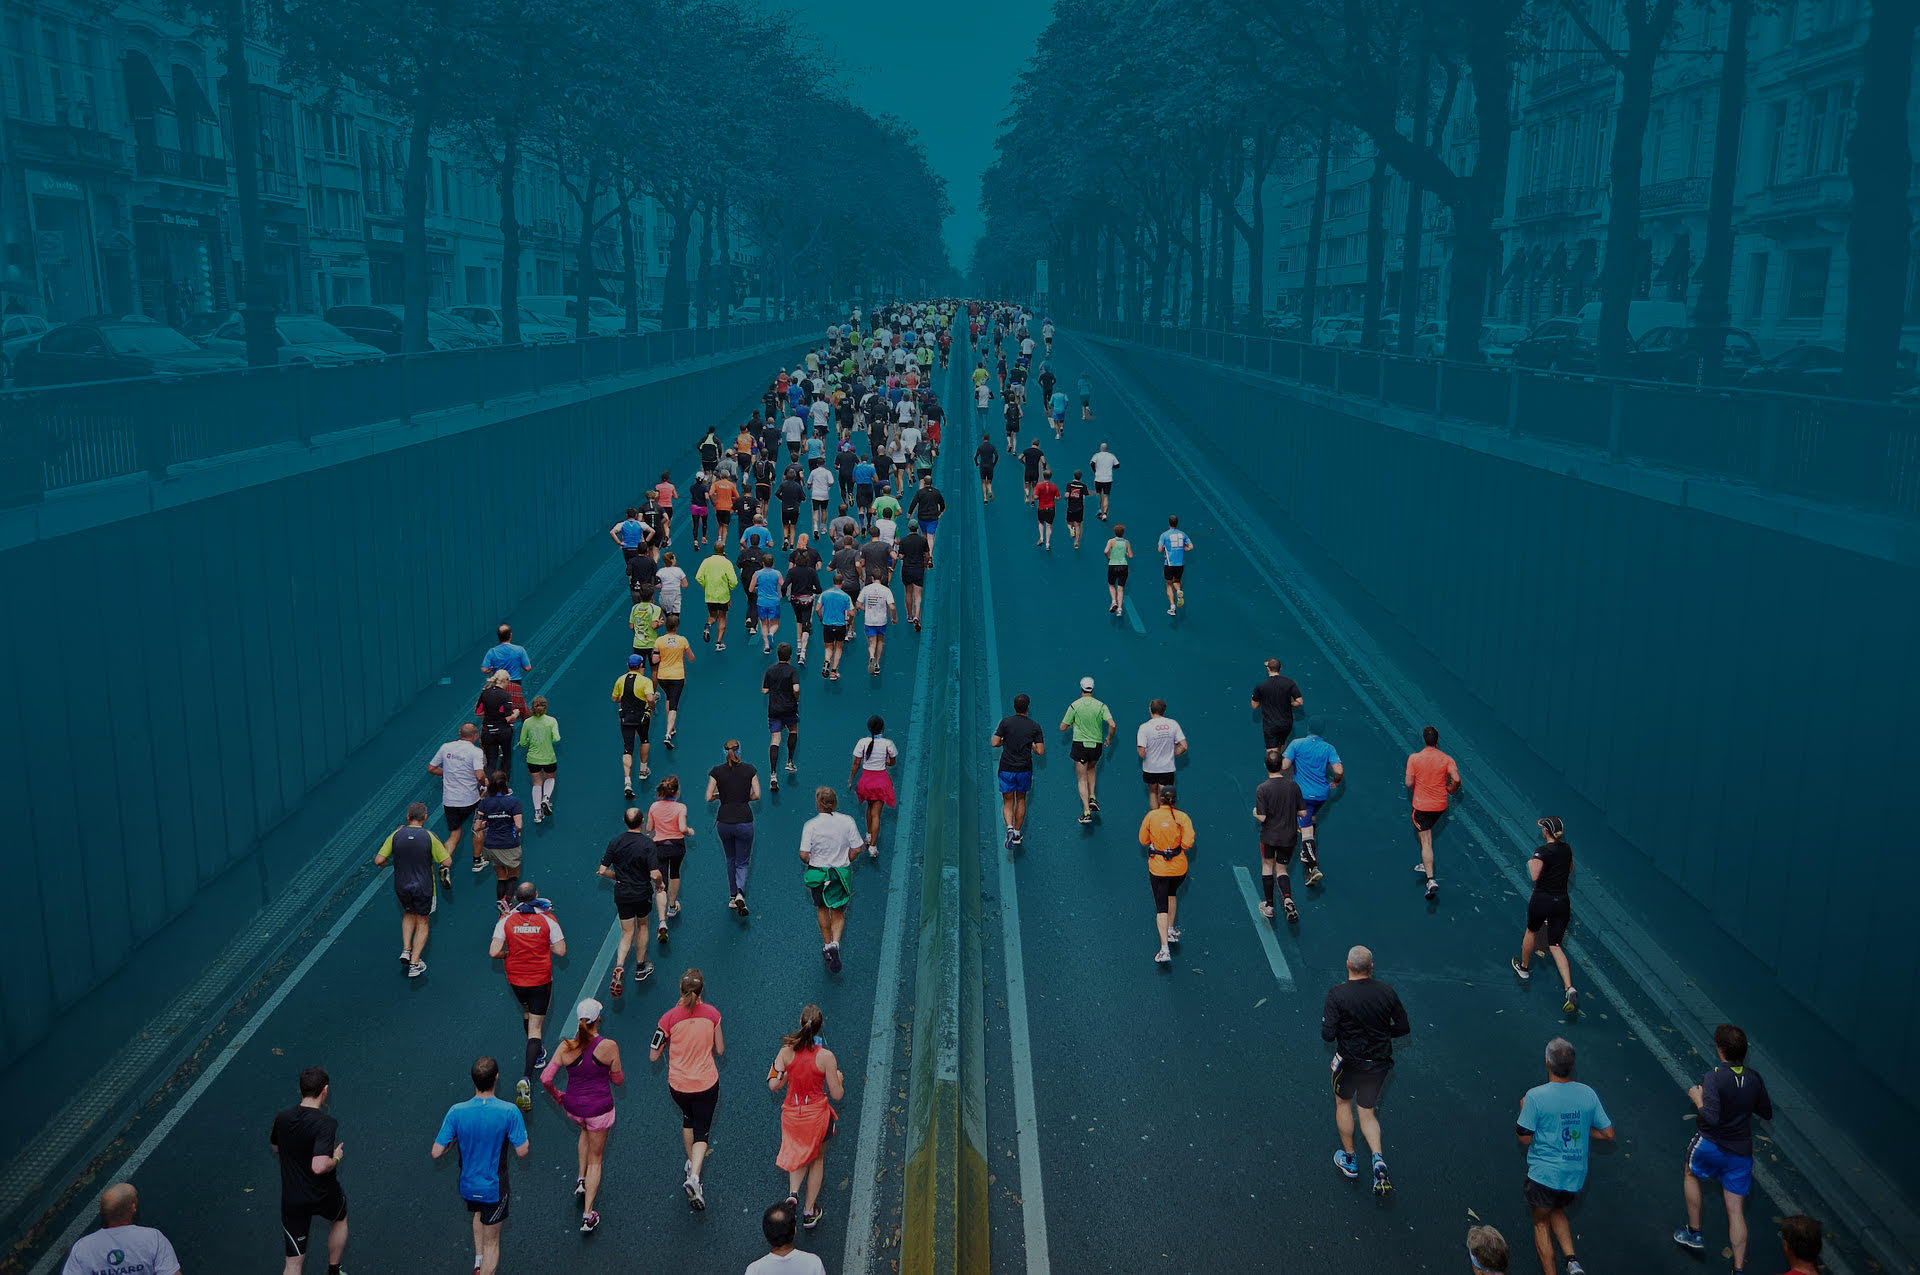 Blue Marathon cropped 2.jpg